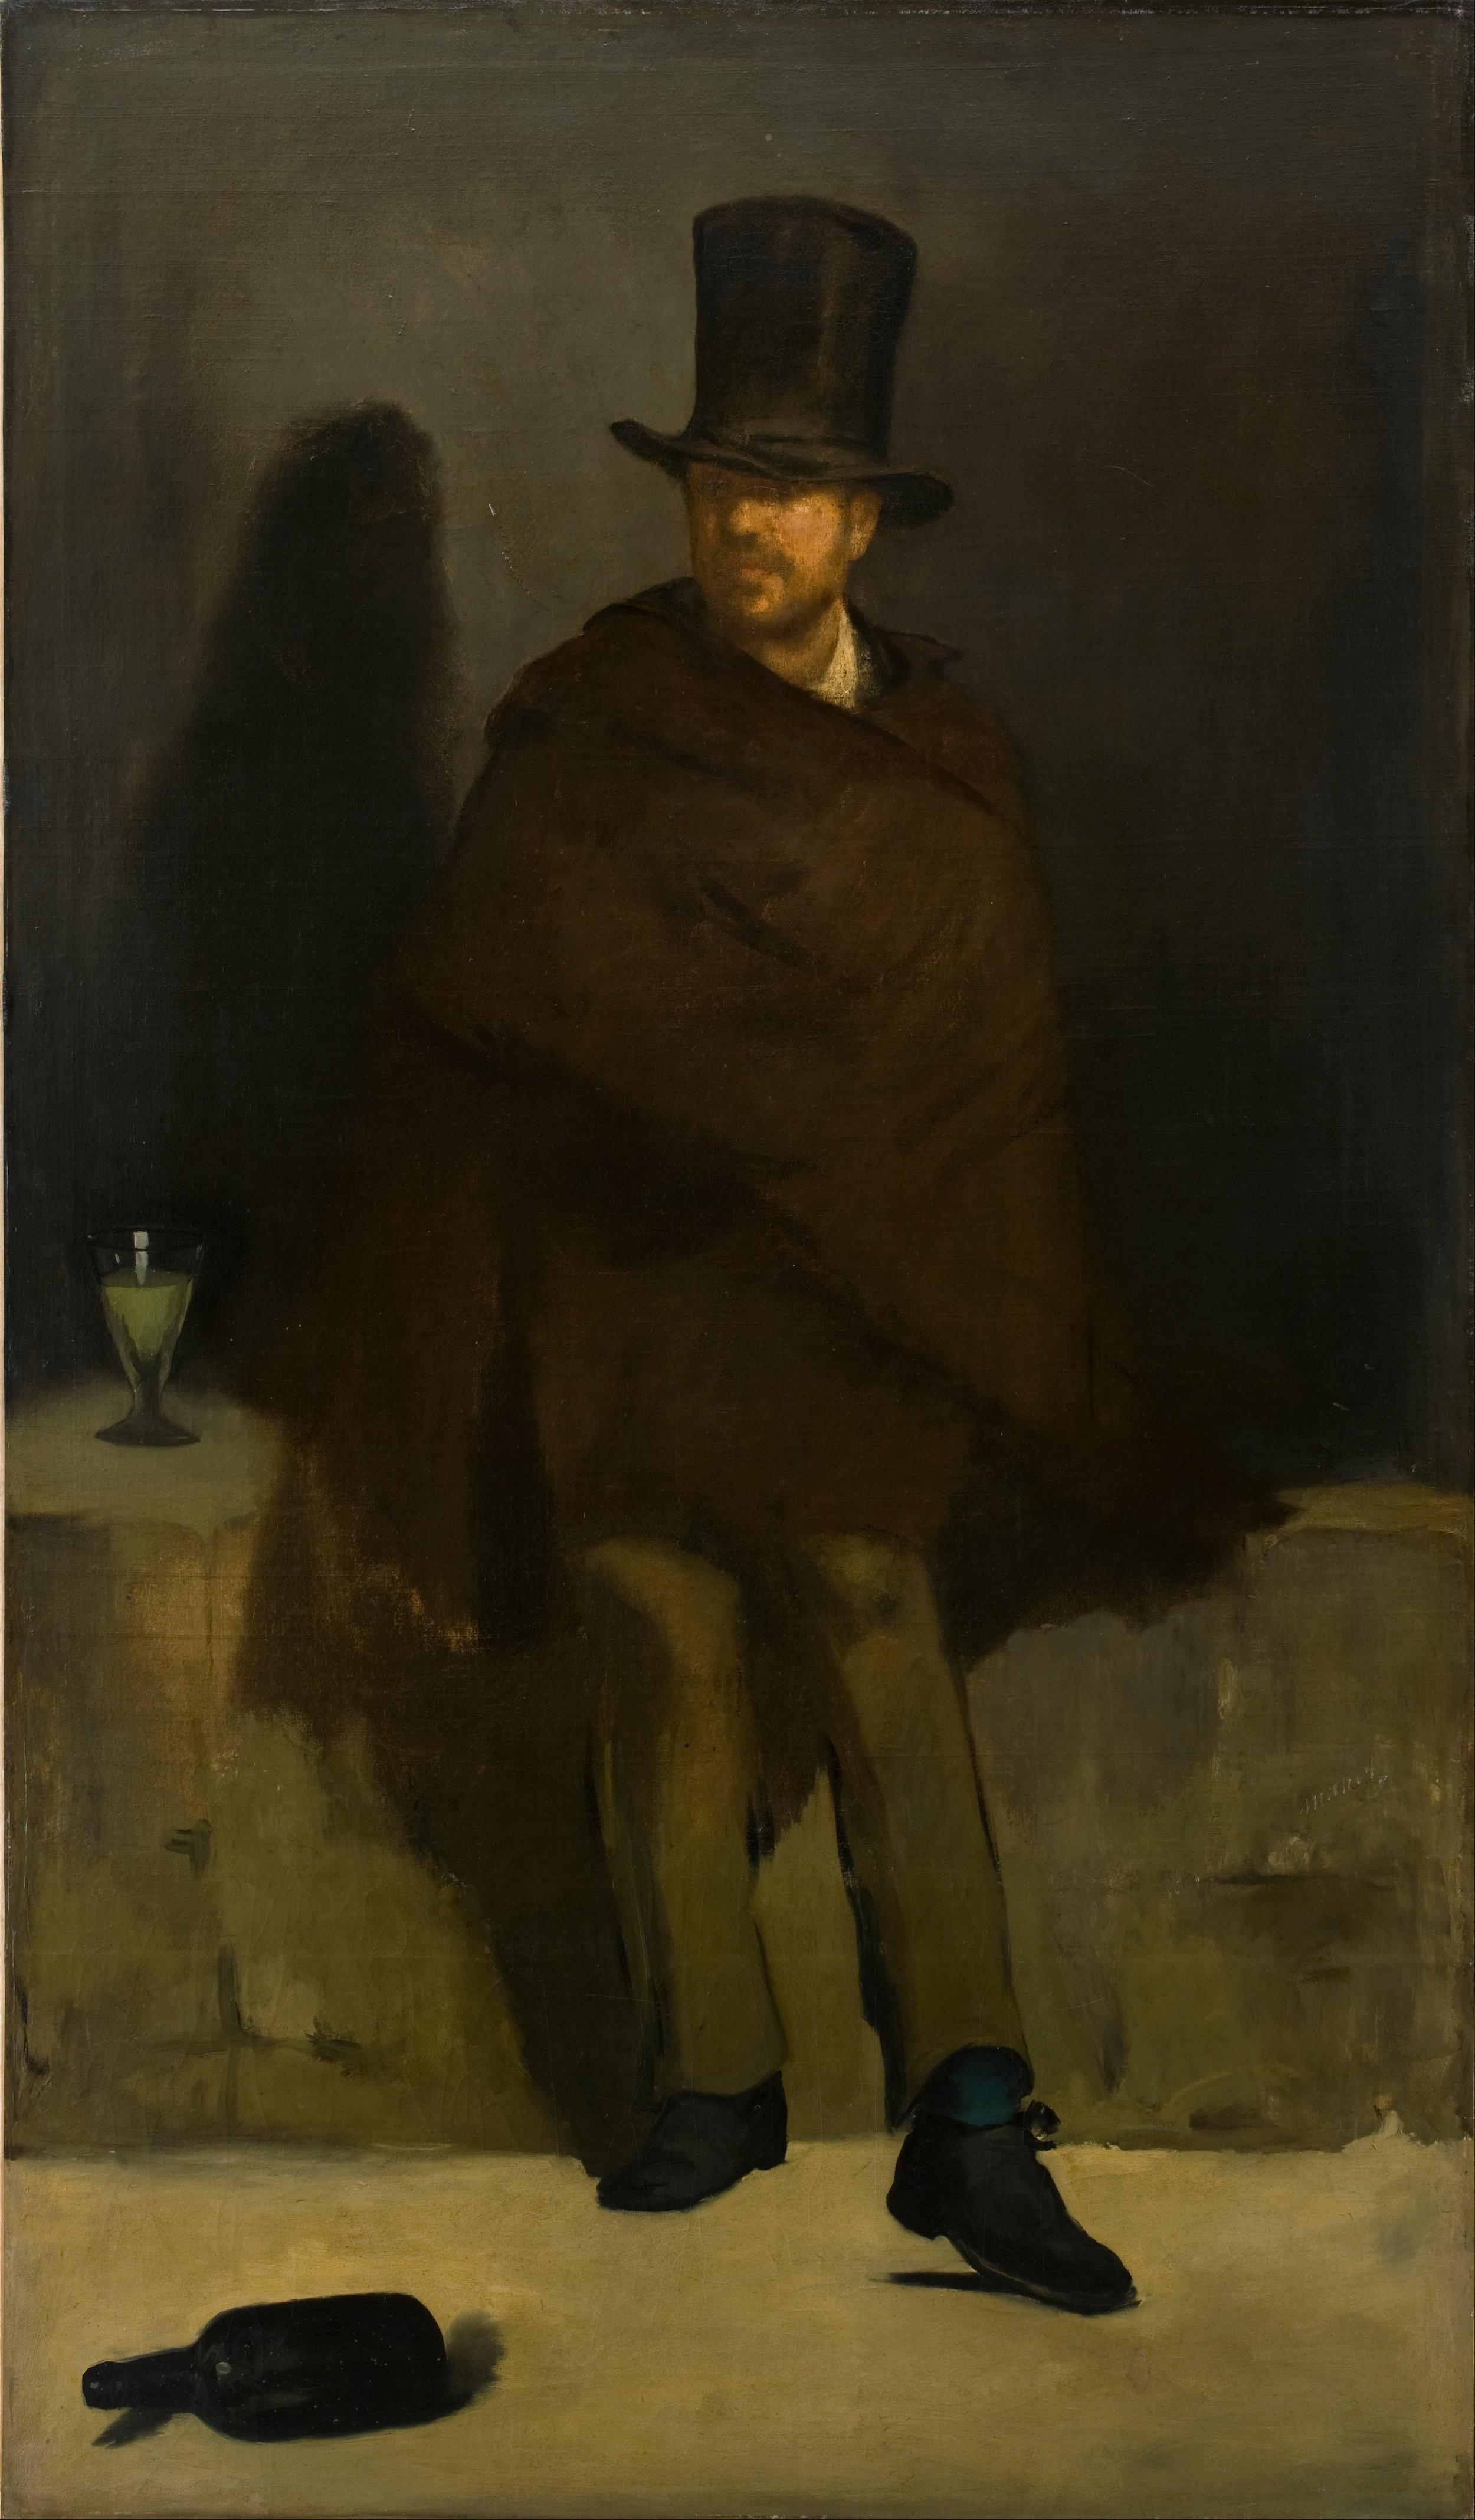 Edouard Manet, The Absinthe Drinker, 1859 (detail)